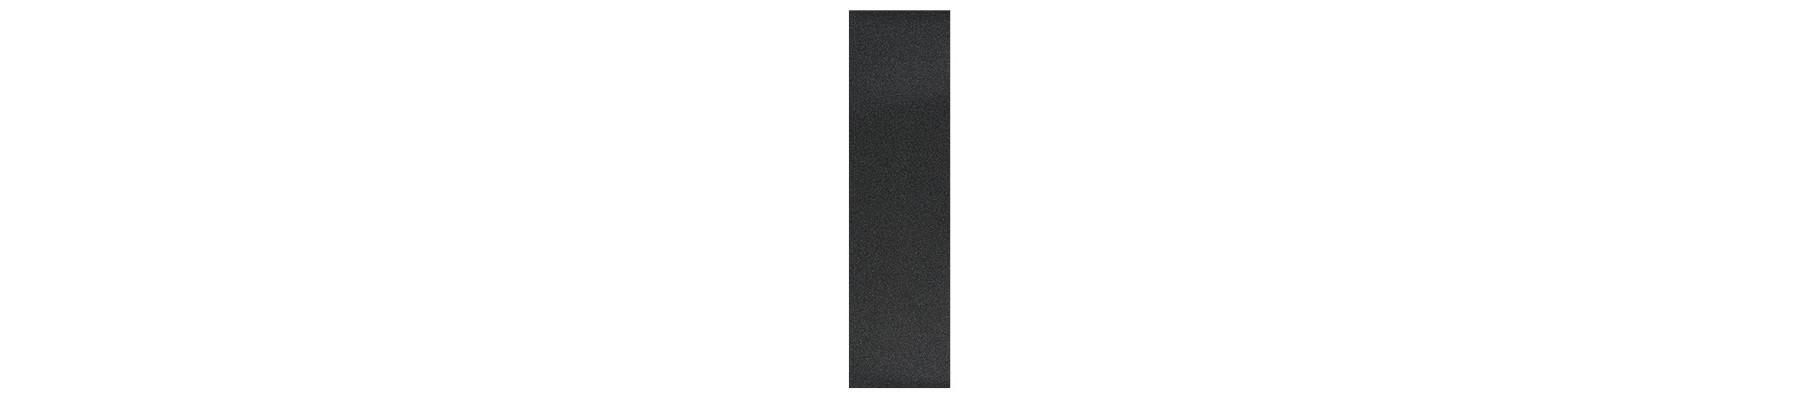 Superior/Black Diamond grip